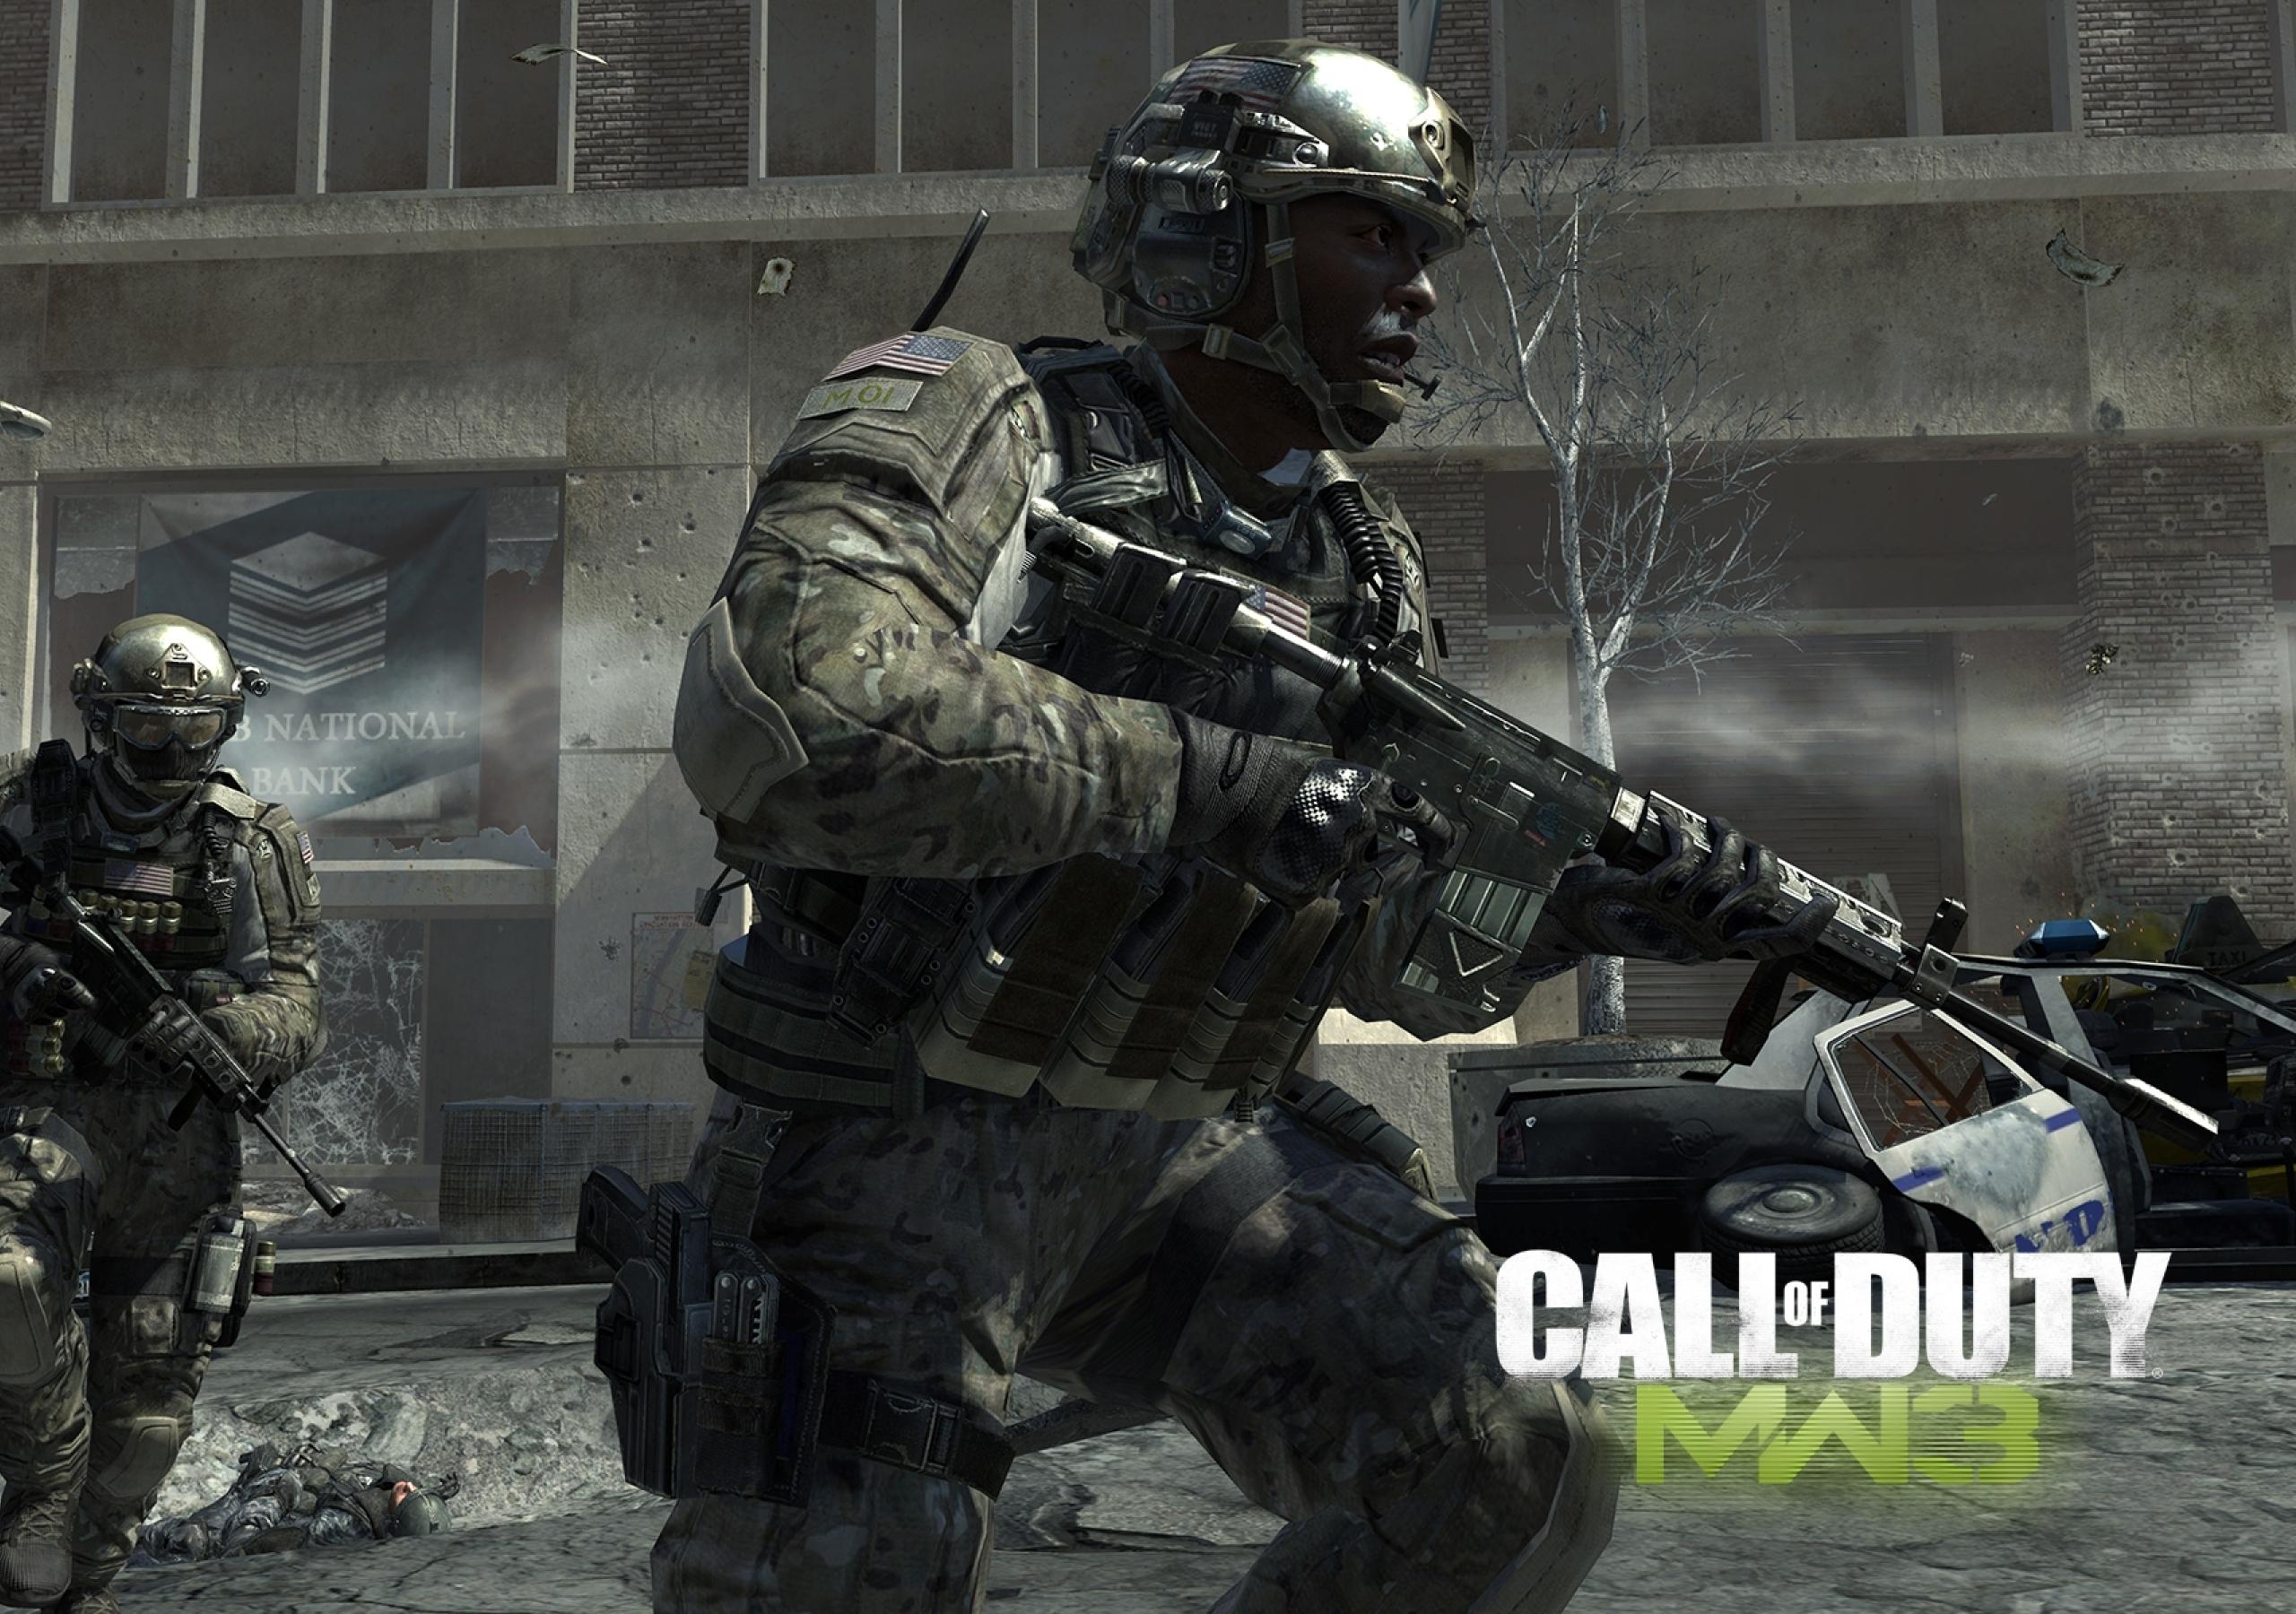 2560x1800 Call Of Duty Modern Warfare 3 Soldiers Bank Machines